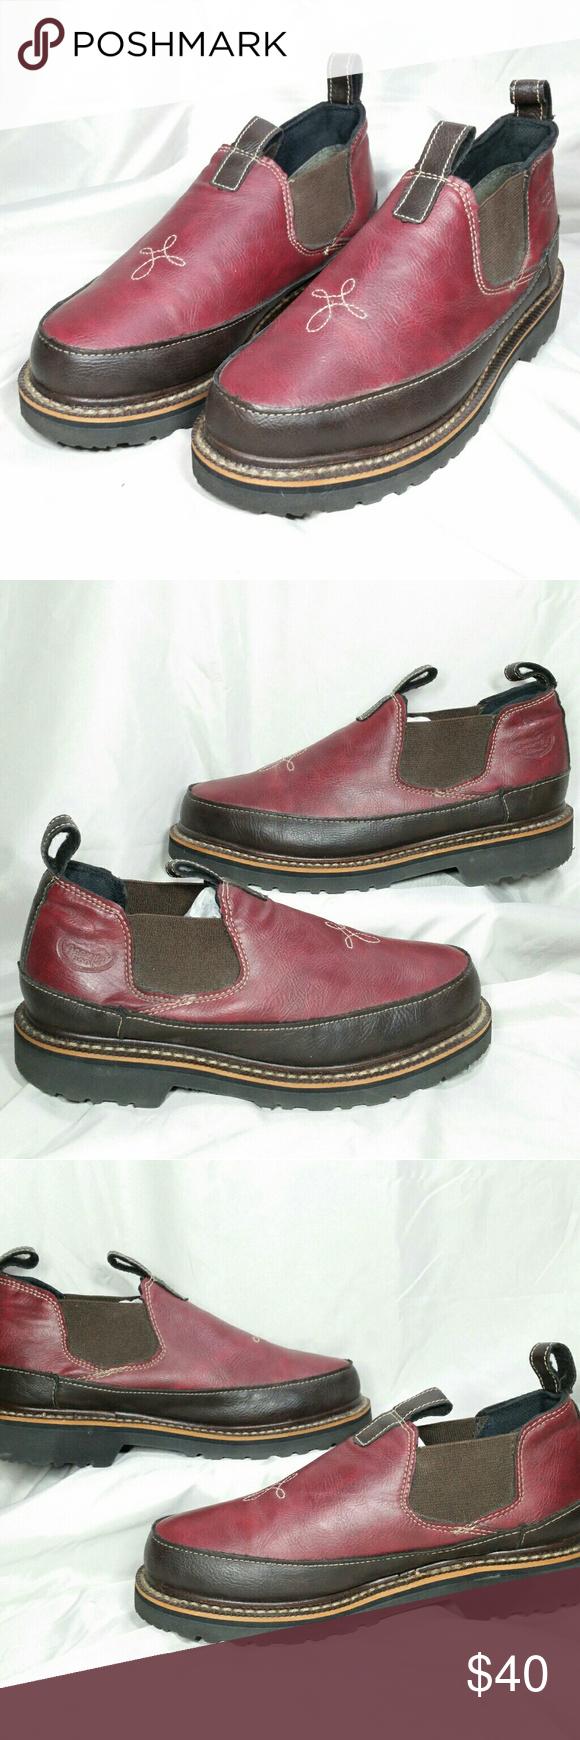 4d7402a1cd6 Georgia Giant Romeo Work Boot Oil Resistant Maroon Women s Georgia Boot  Georgia Giant Romeo work boots